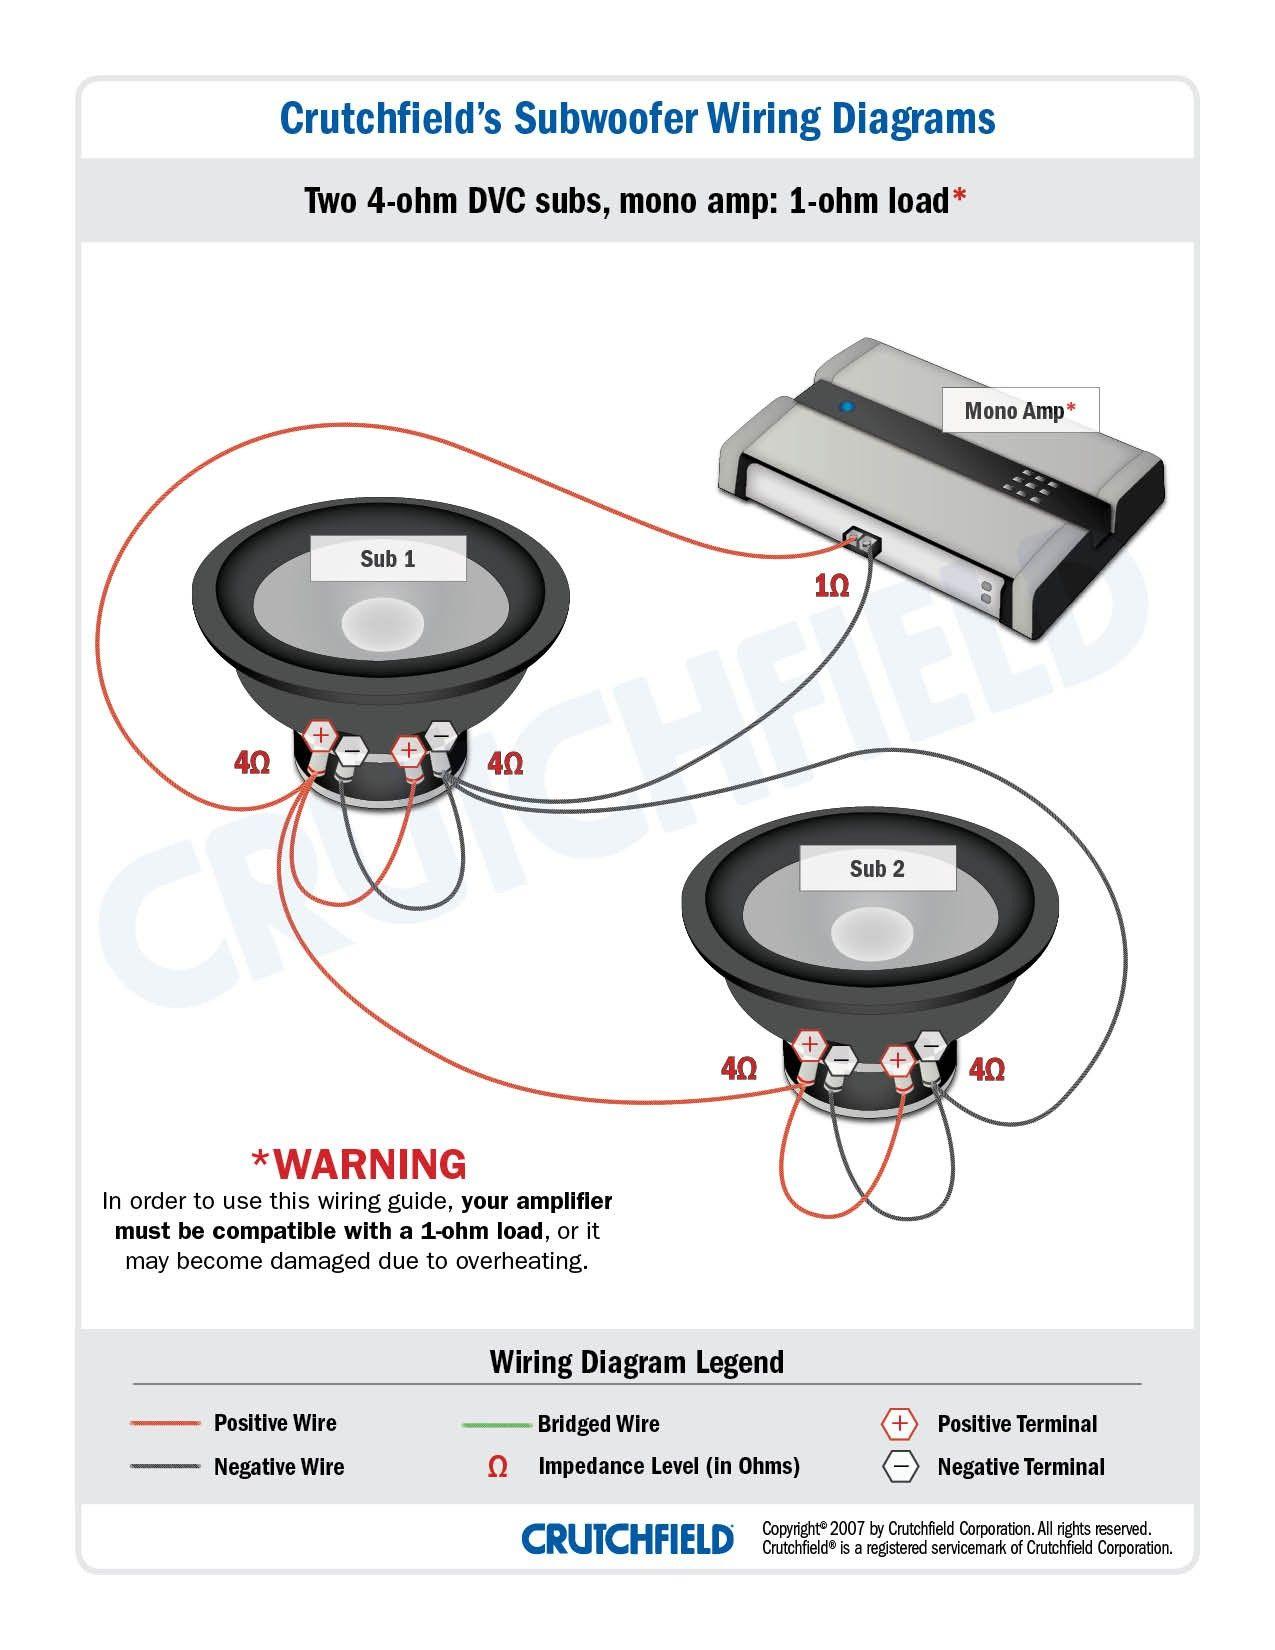 Amplifier Capacitor Wiring Diagram Diagram Diagramtemplate Diagramsample Subwoofer Wiring Car Audio Car Audio Capacitor